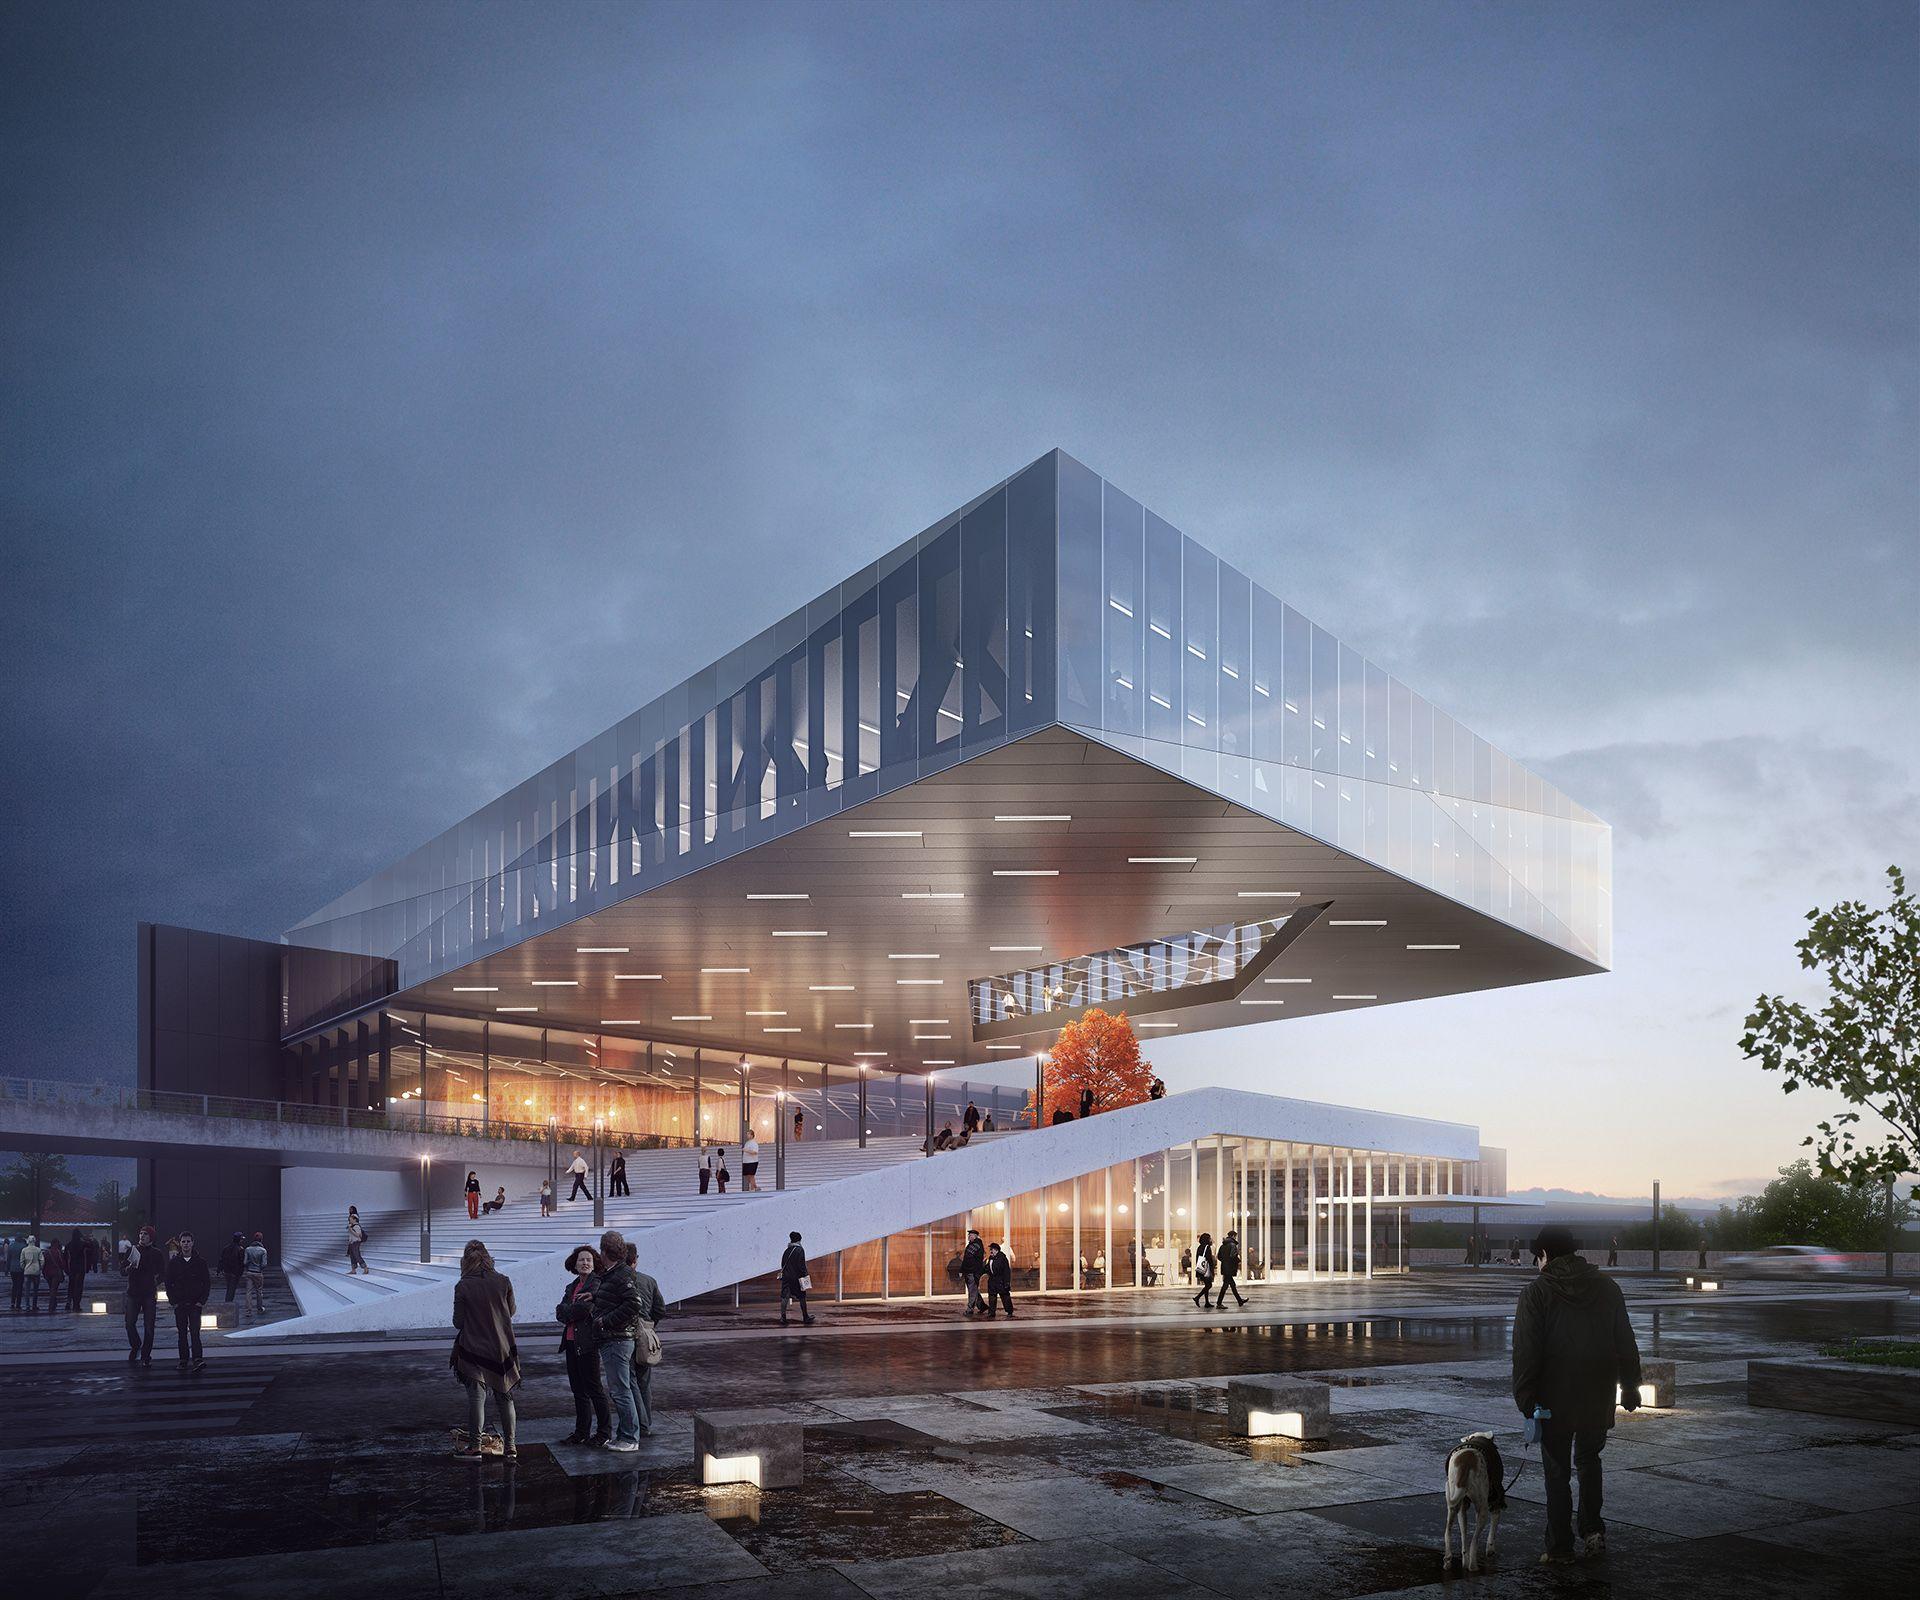 996 Best Archi Architecture Images On Pinterest: Image Result For Plassen Cultural Center